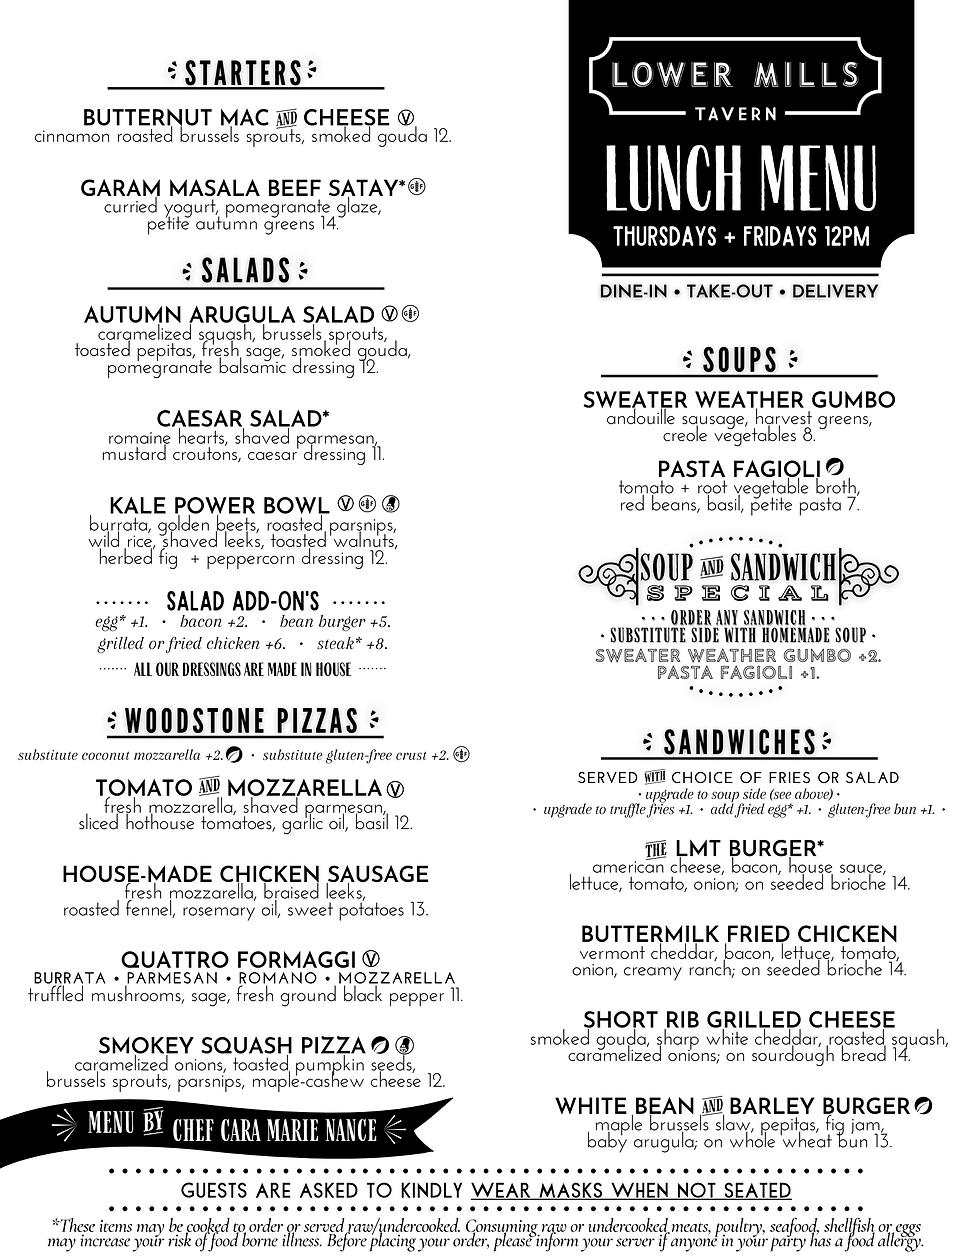 LMT Lunch Menu Fall 2020.png